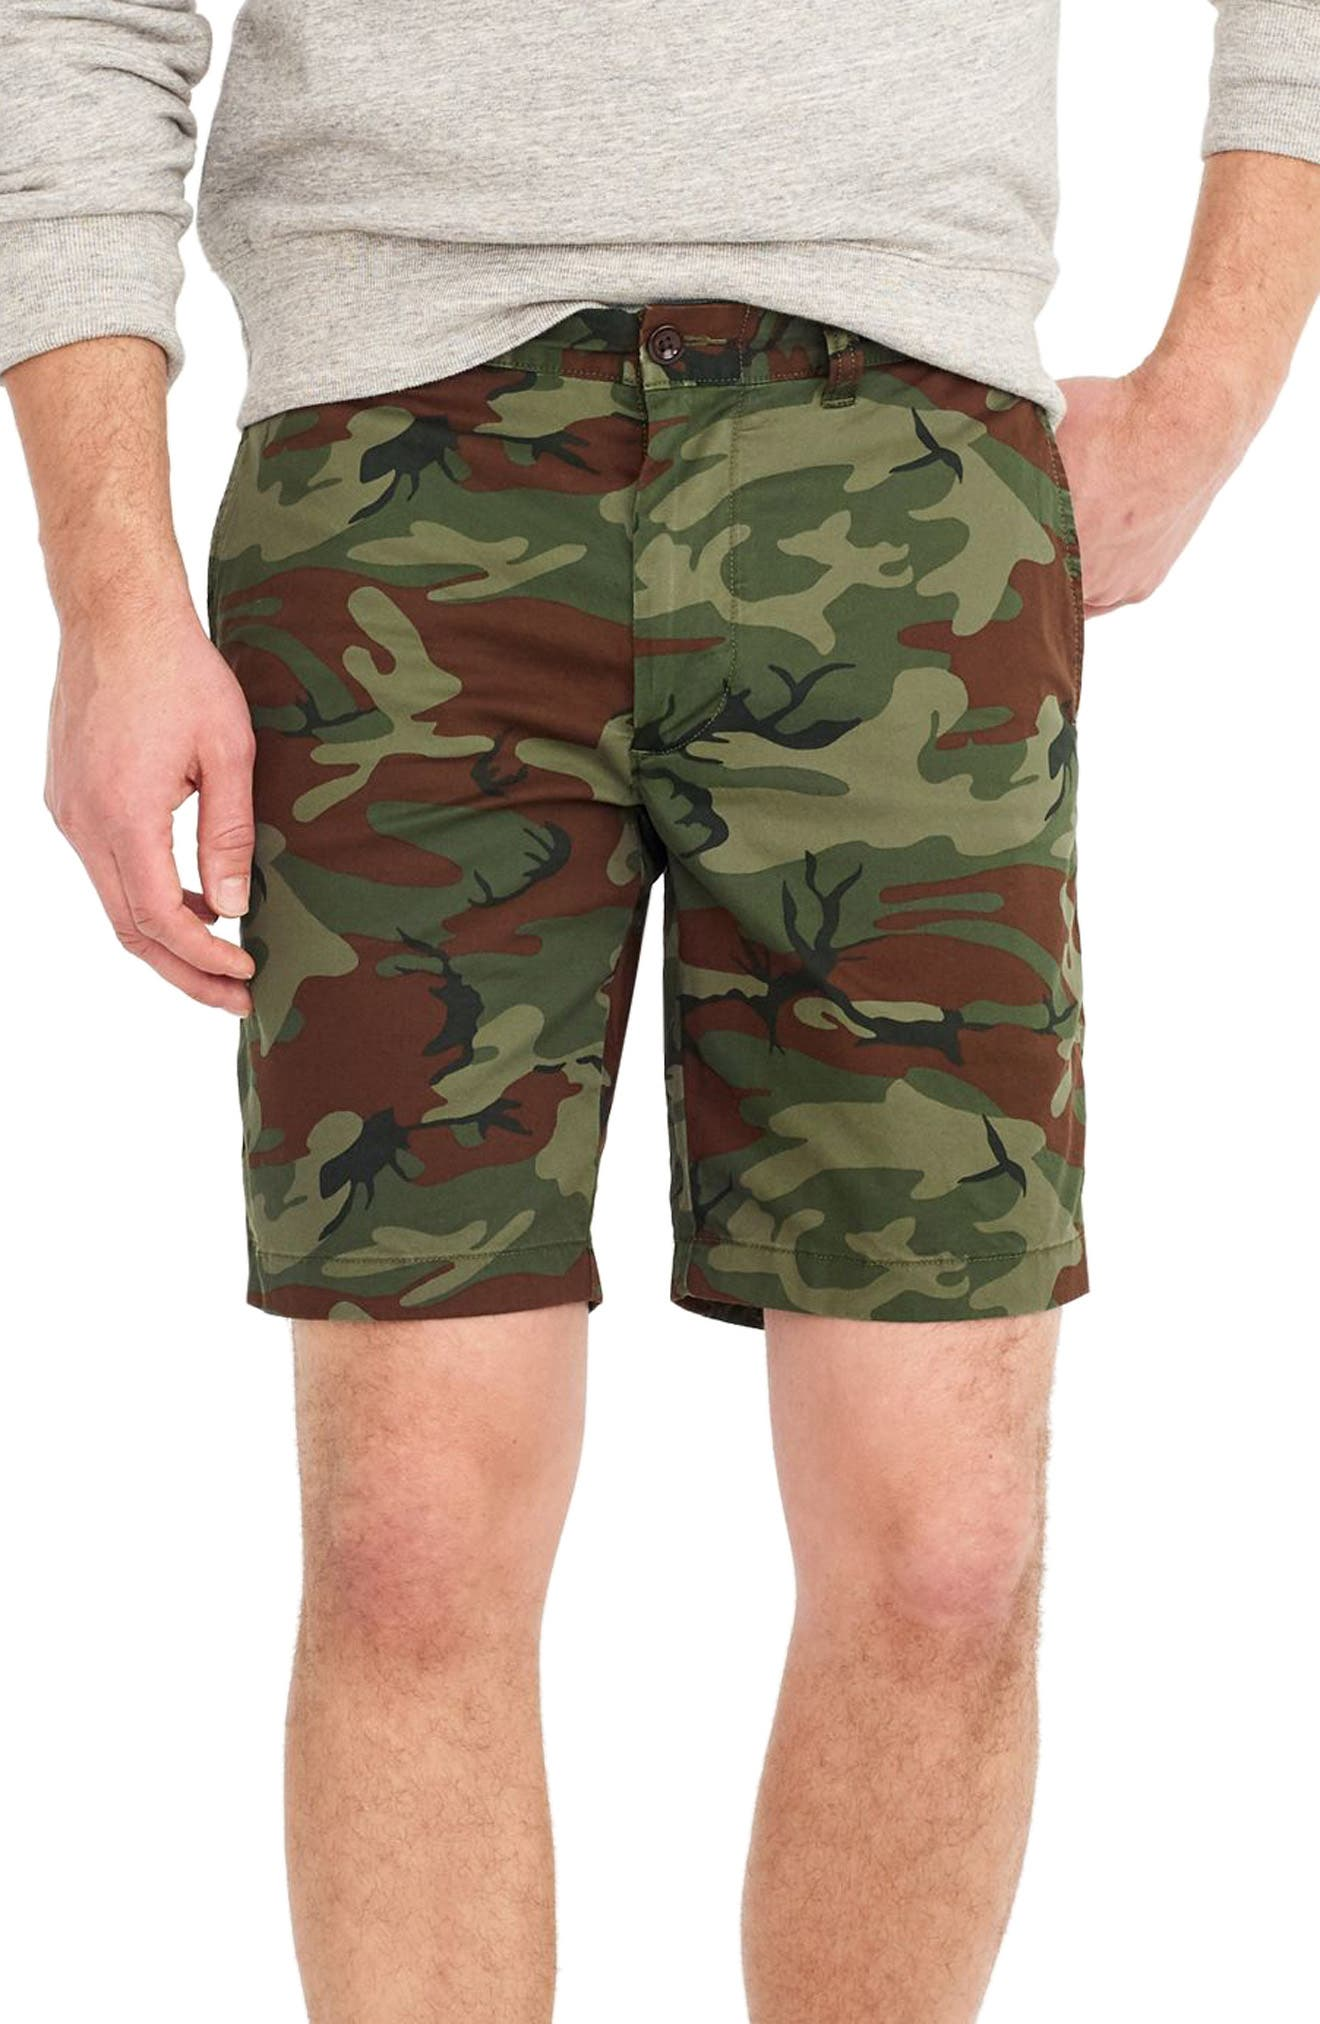 J.Crew Stretch Camo Shorts,                             Main thumbnail 1, color,                             Camo Wamo